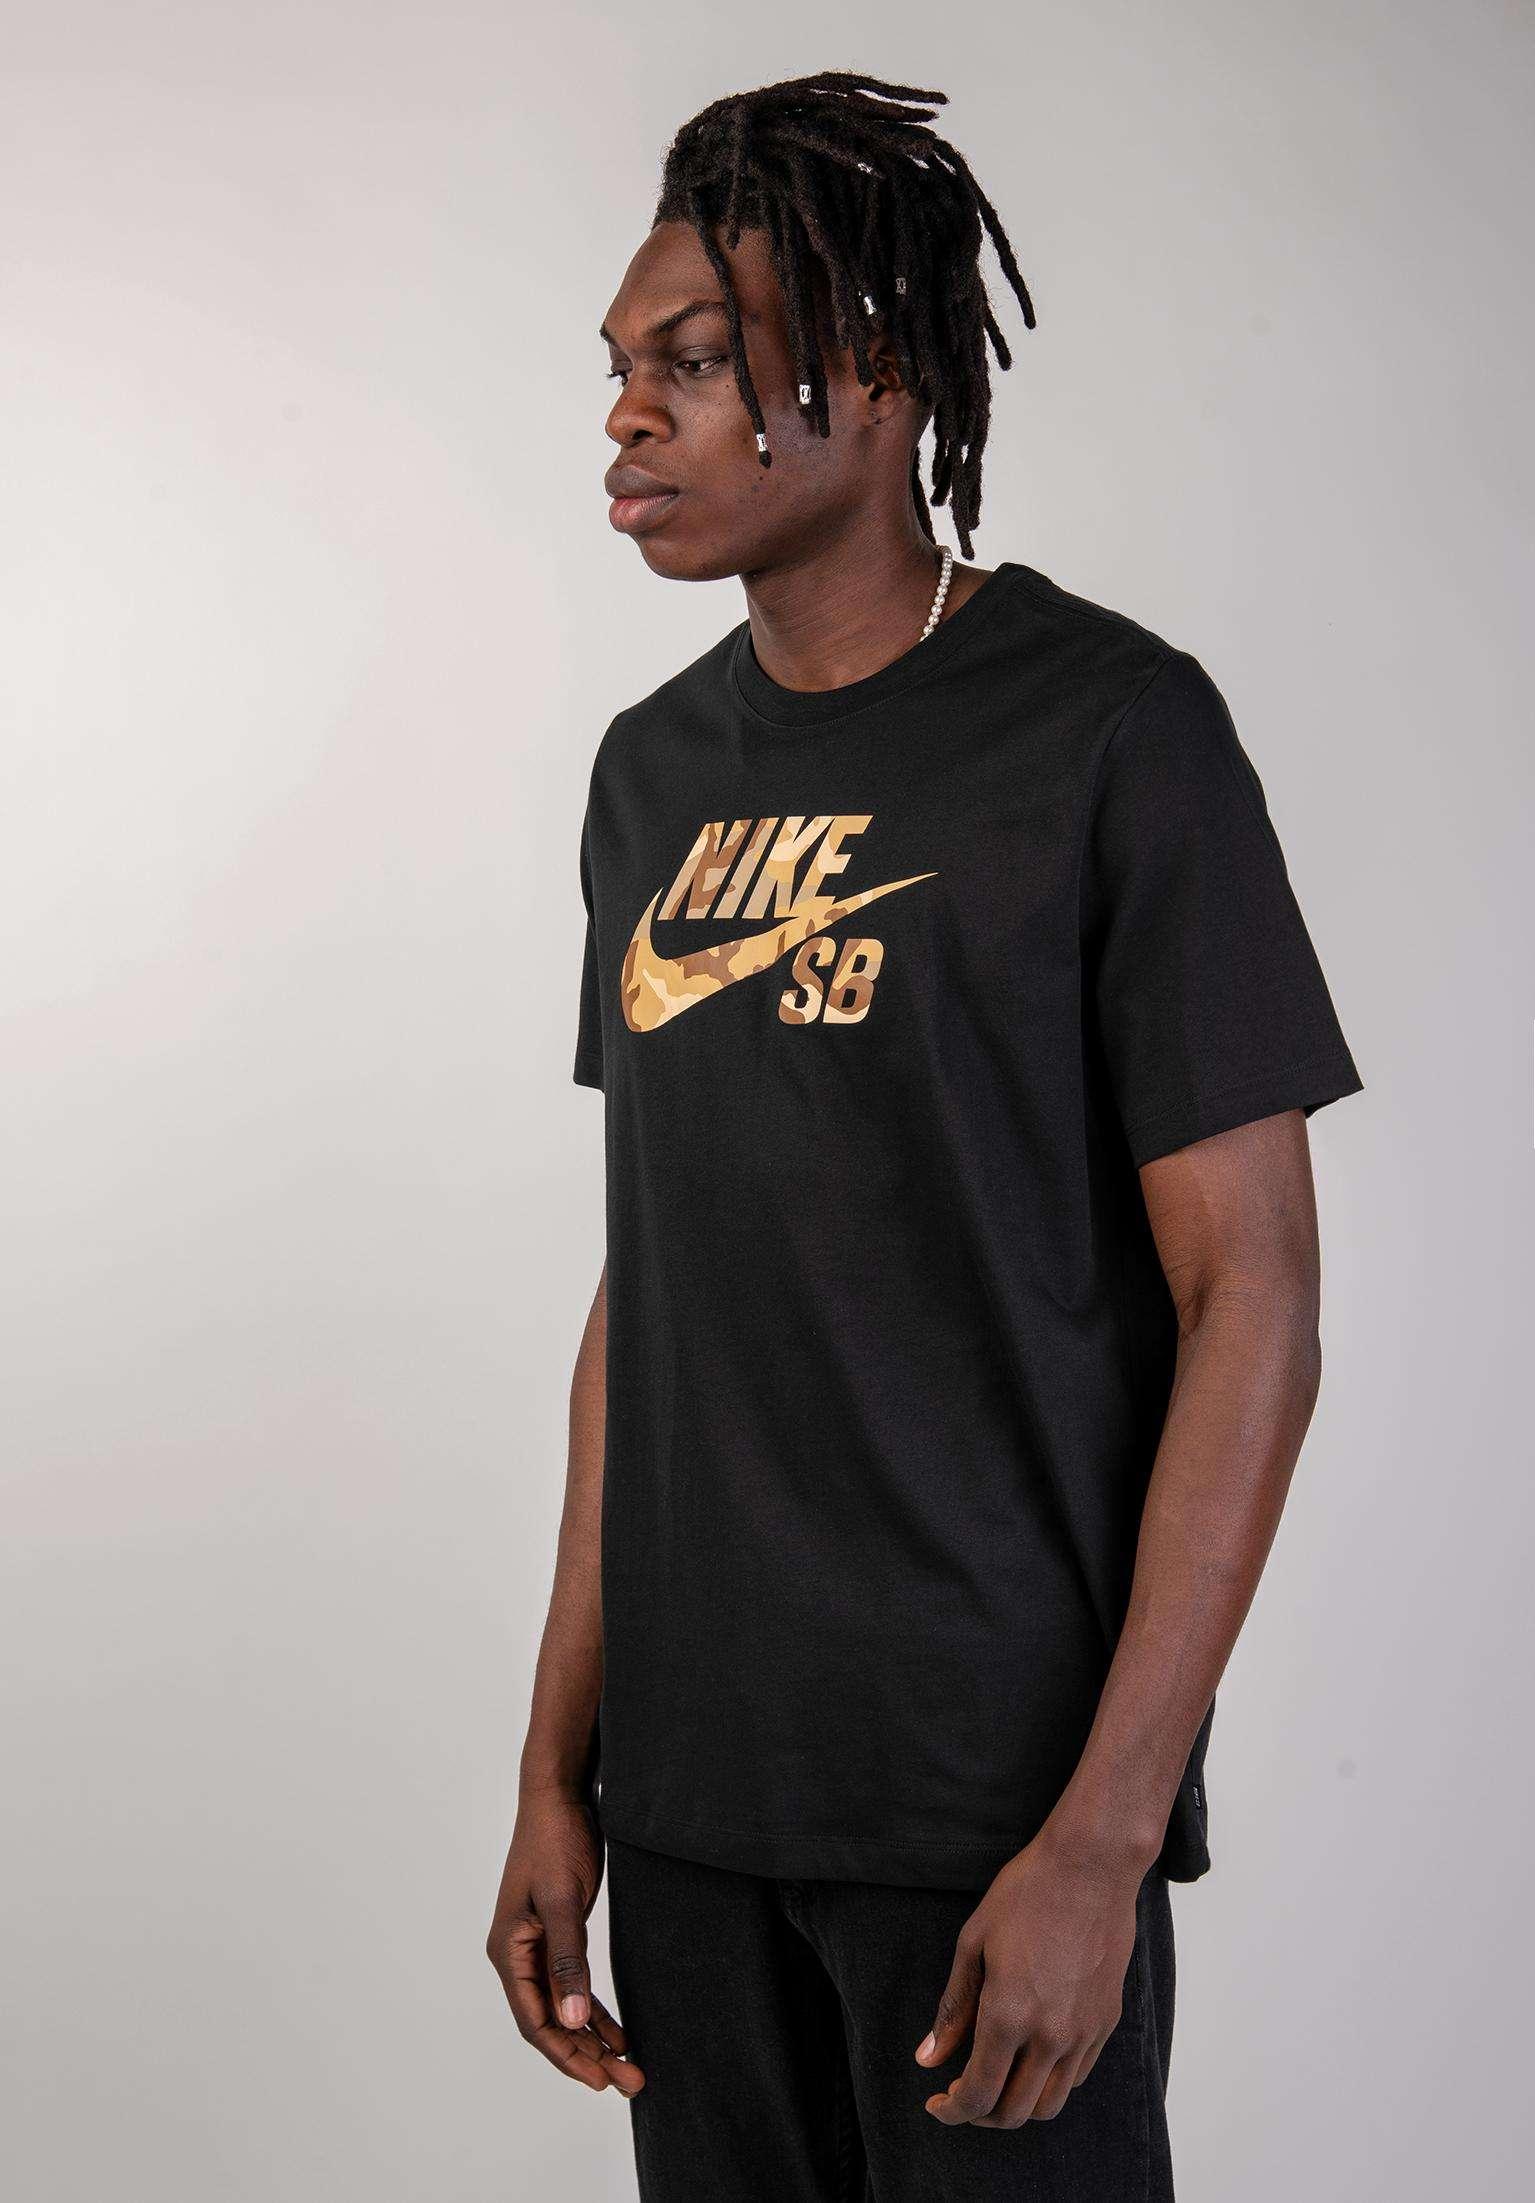 b0fed87562f9 DFT Icon Logo Snsl 2 Nike SB T-Shirts in black-desertcamo for Men | Titus